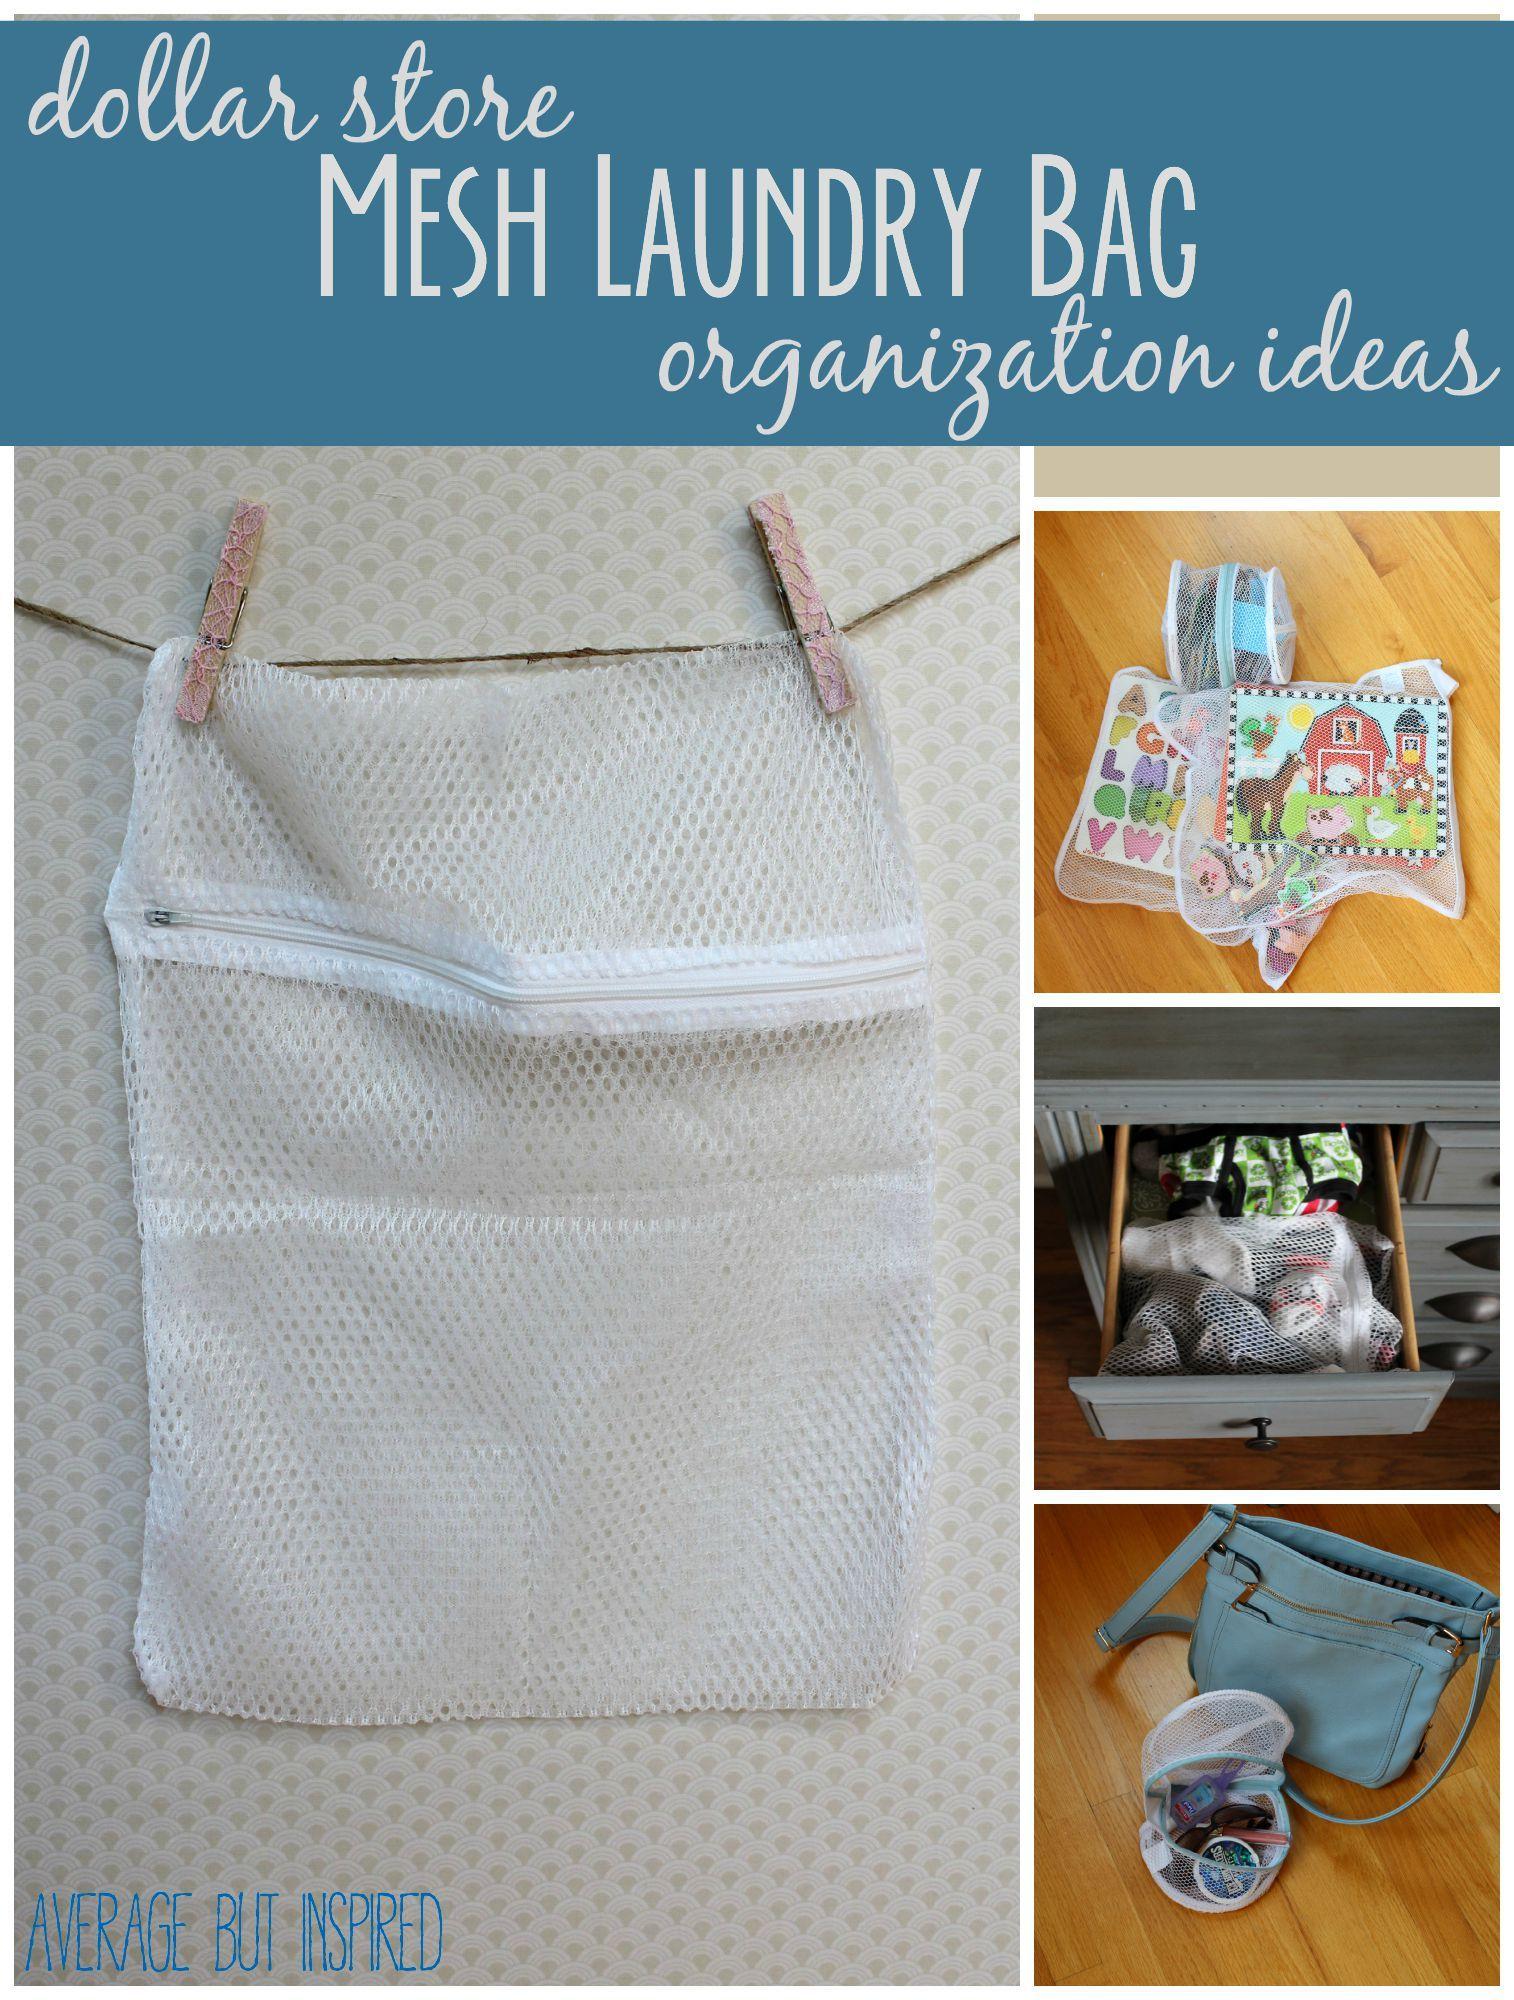 Dollar Store Ganization Mesh Laundry Bag Organization Ideas